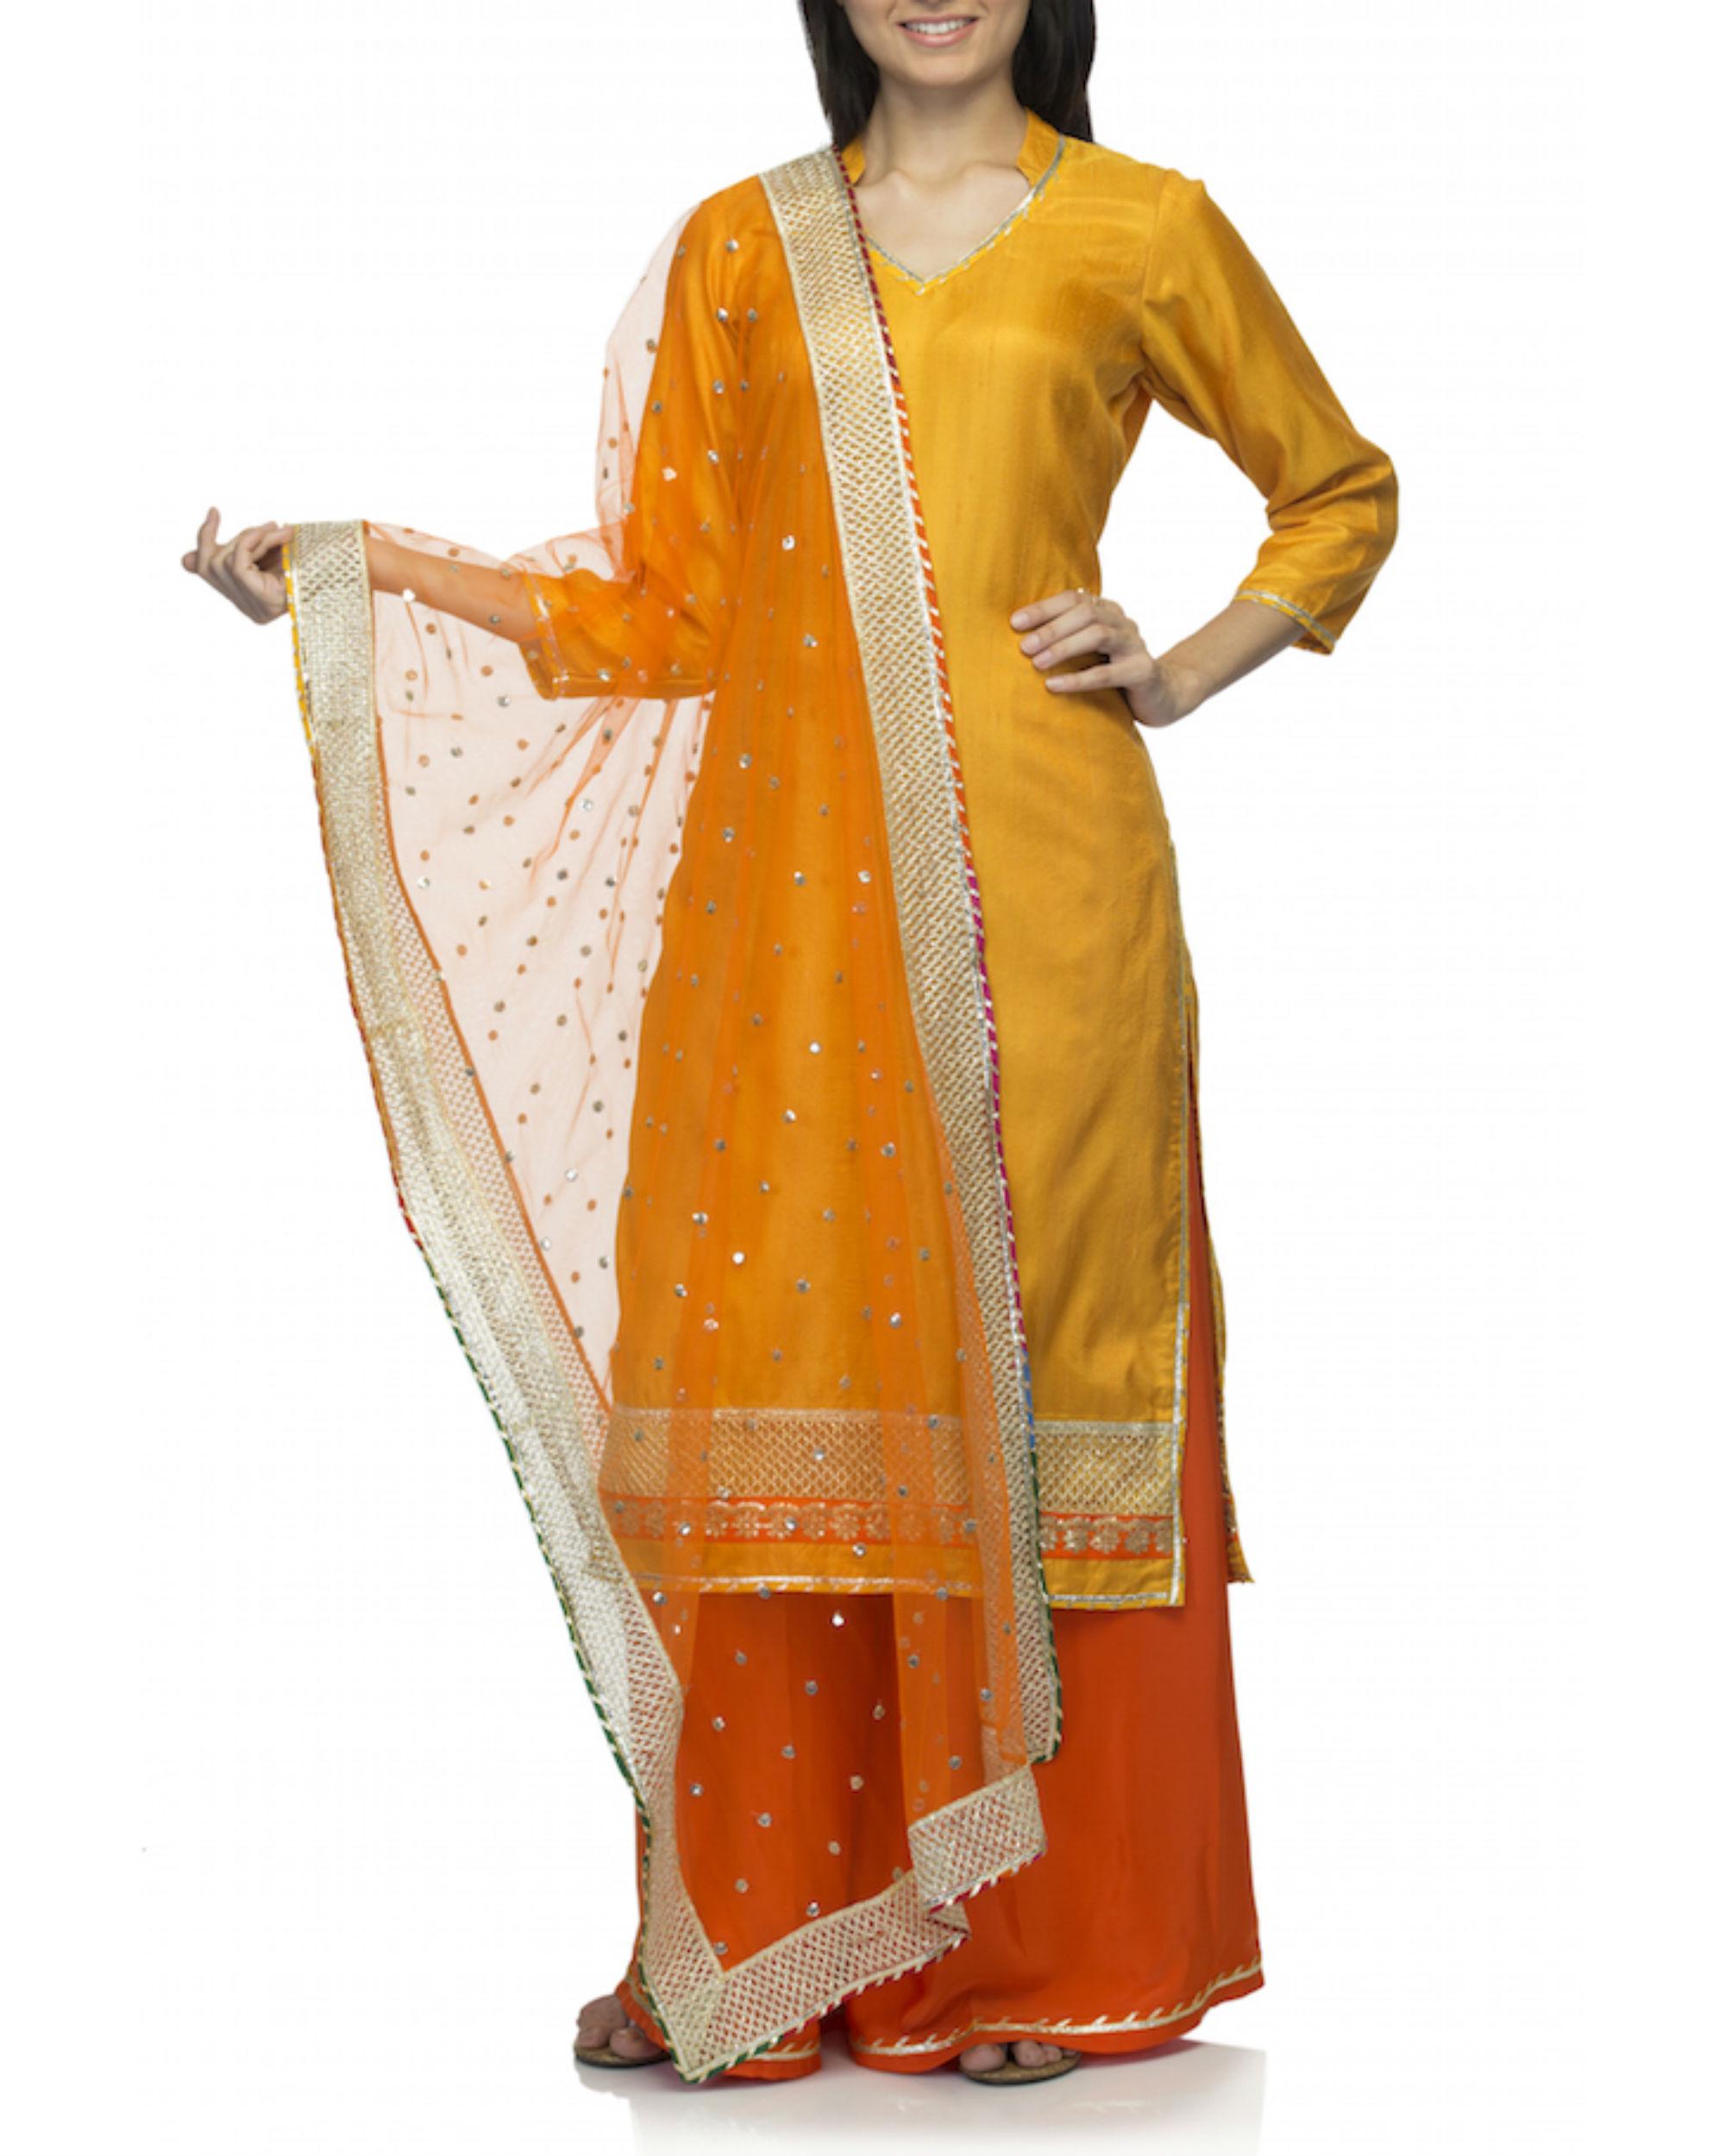 2209c101d87 Orange yellow kurta set with dupatta by Rang by Manjula Soni